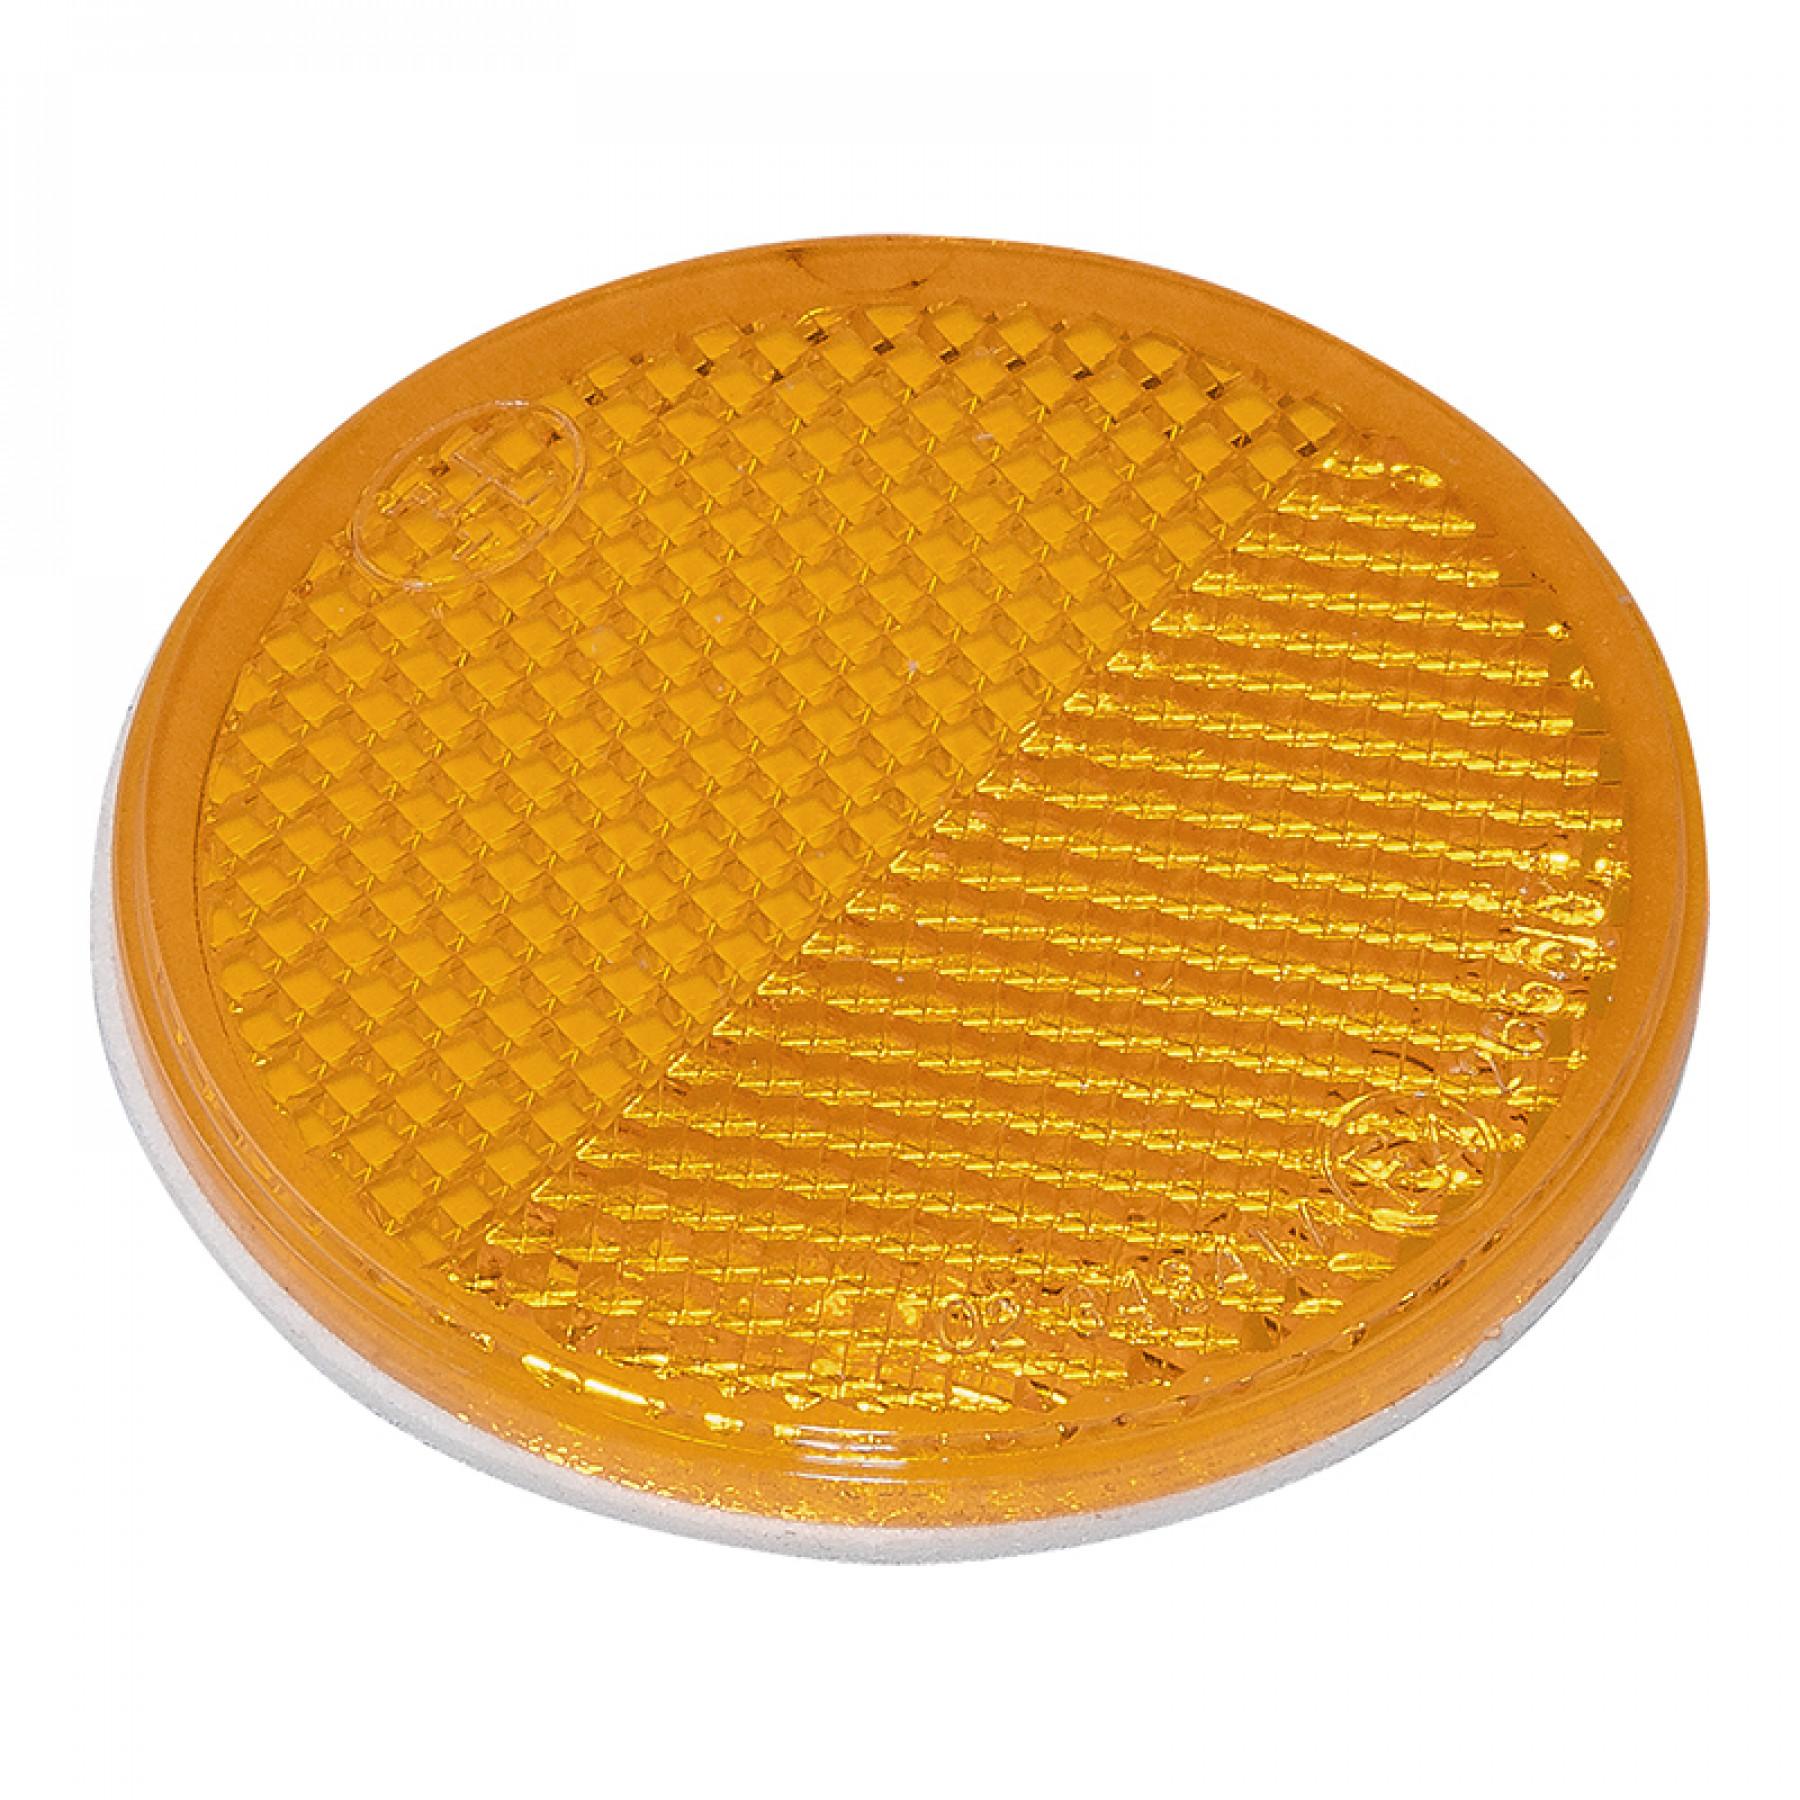 Reflector Oranje rond 60mm plak (2) Blister